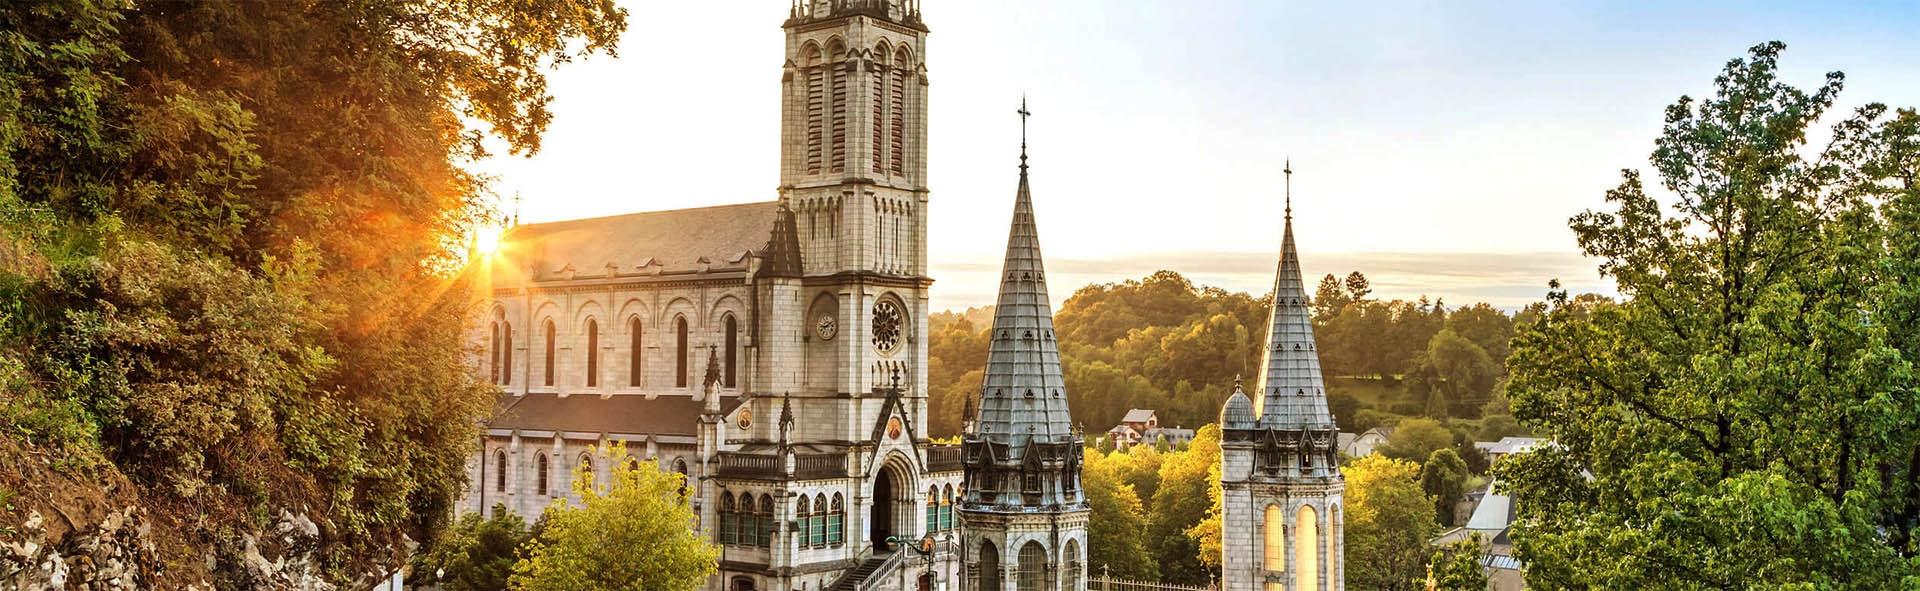 Pellegrinaggio a Lourdes in Pullman dal Nord Ottobre